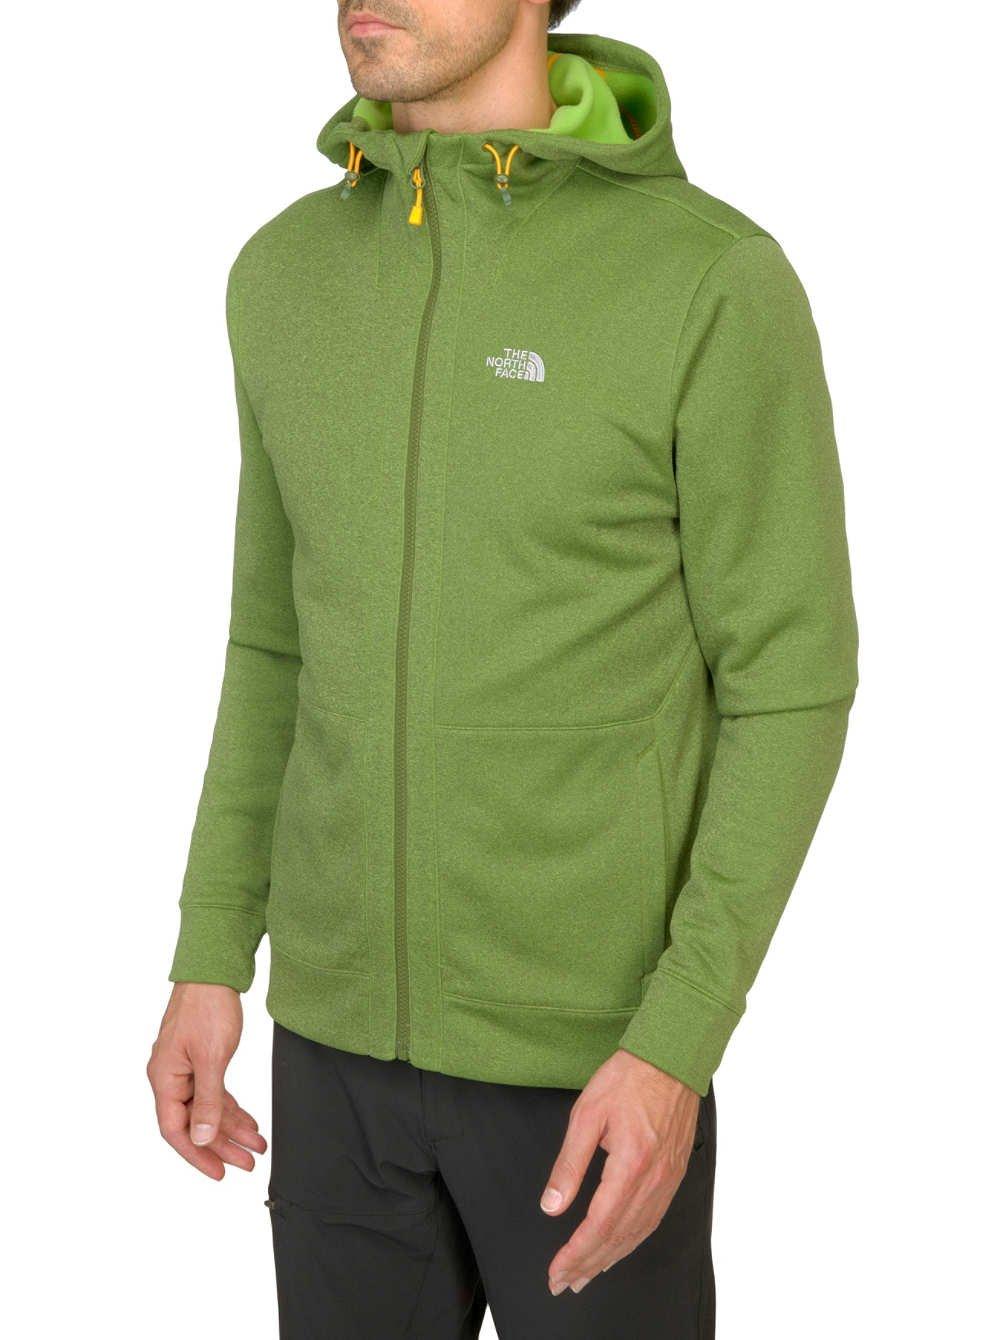 b02d7fdb8 THE NORTH FACE Men's Mittellegi Full Zip Fleece Hoodie Jacket